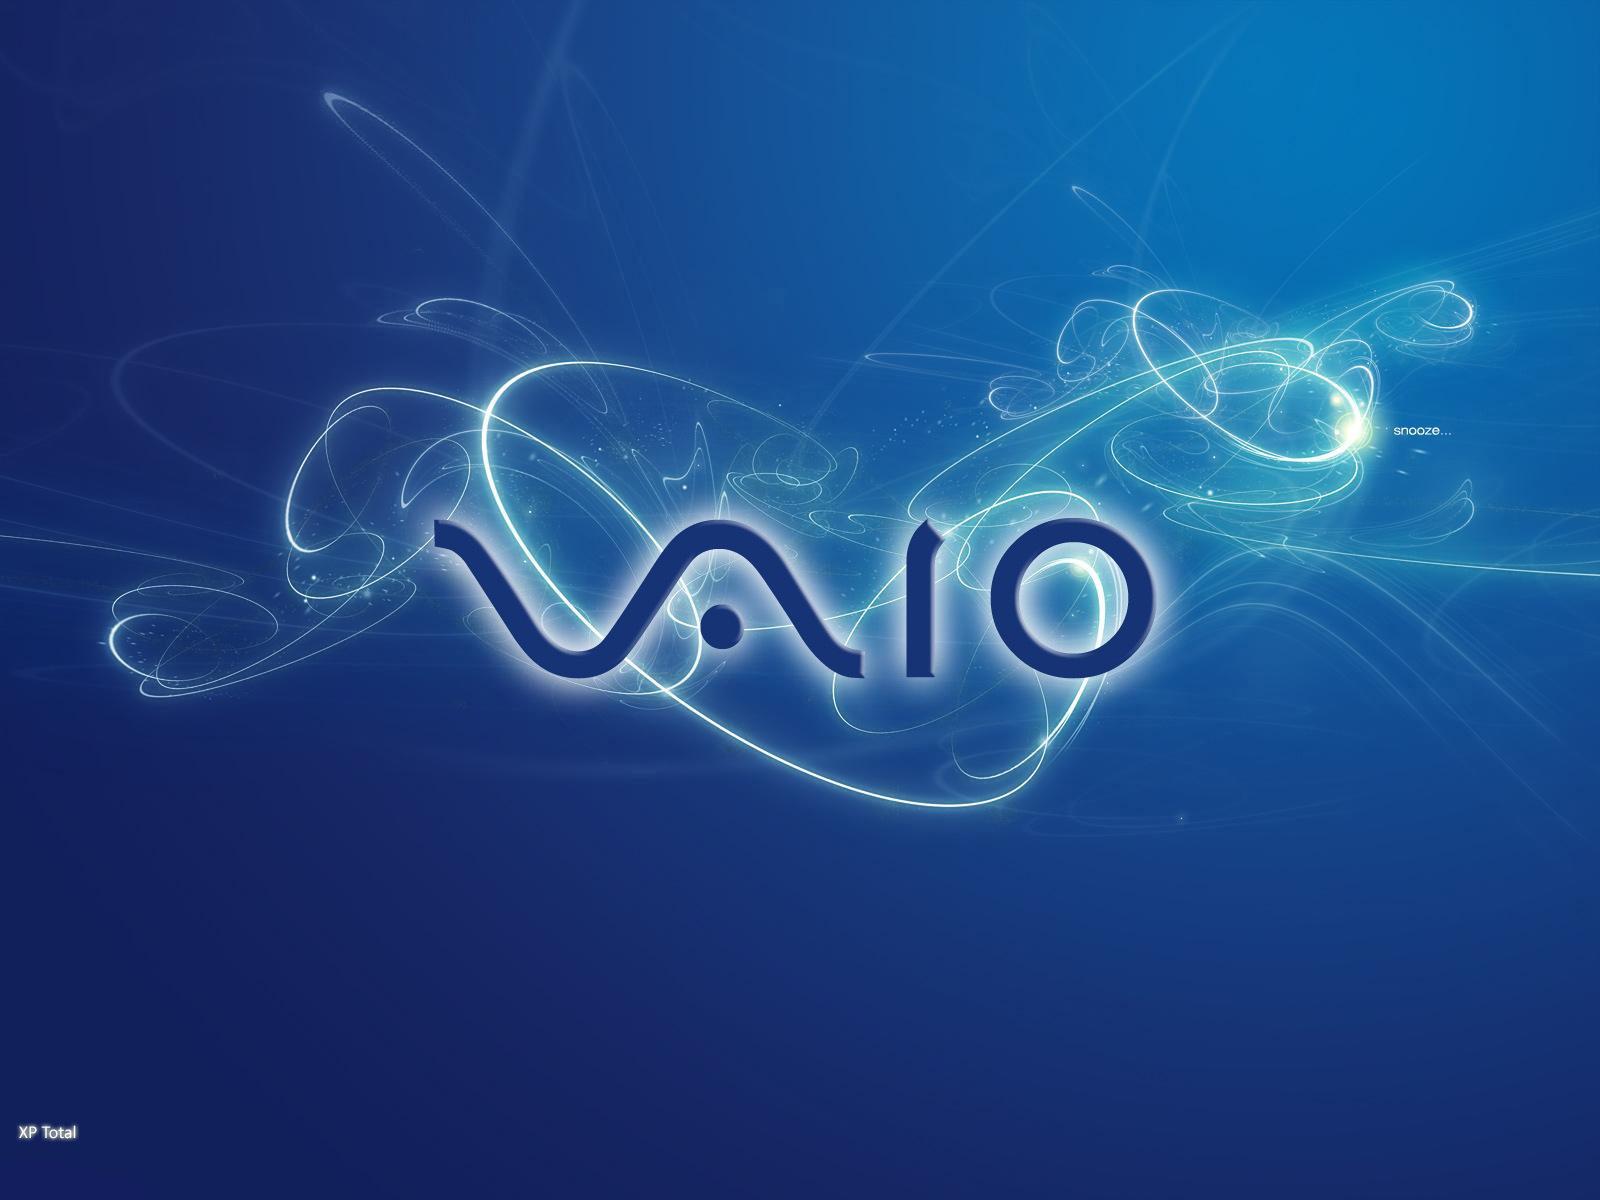 Vaio Wallpaper 1280x800: Sony Vaio Wallpaper 1080p